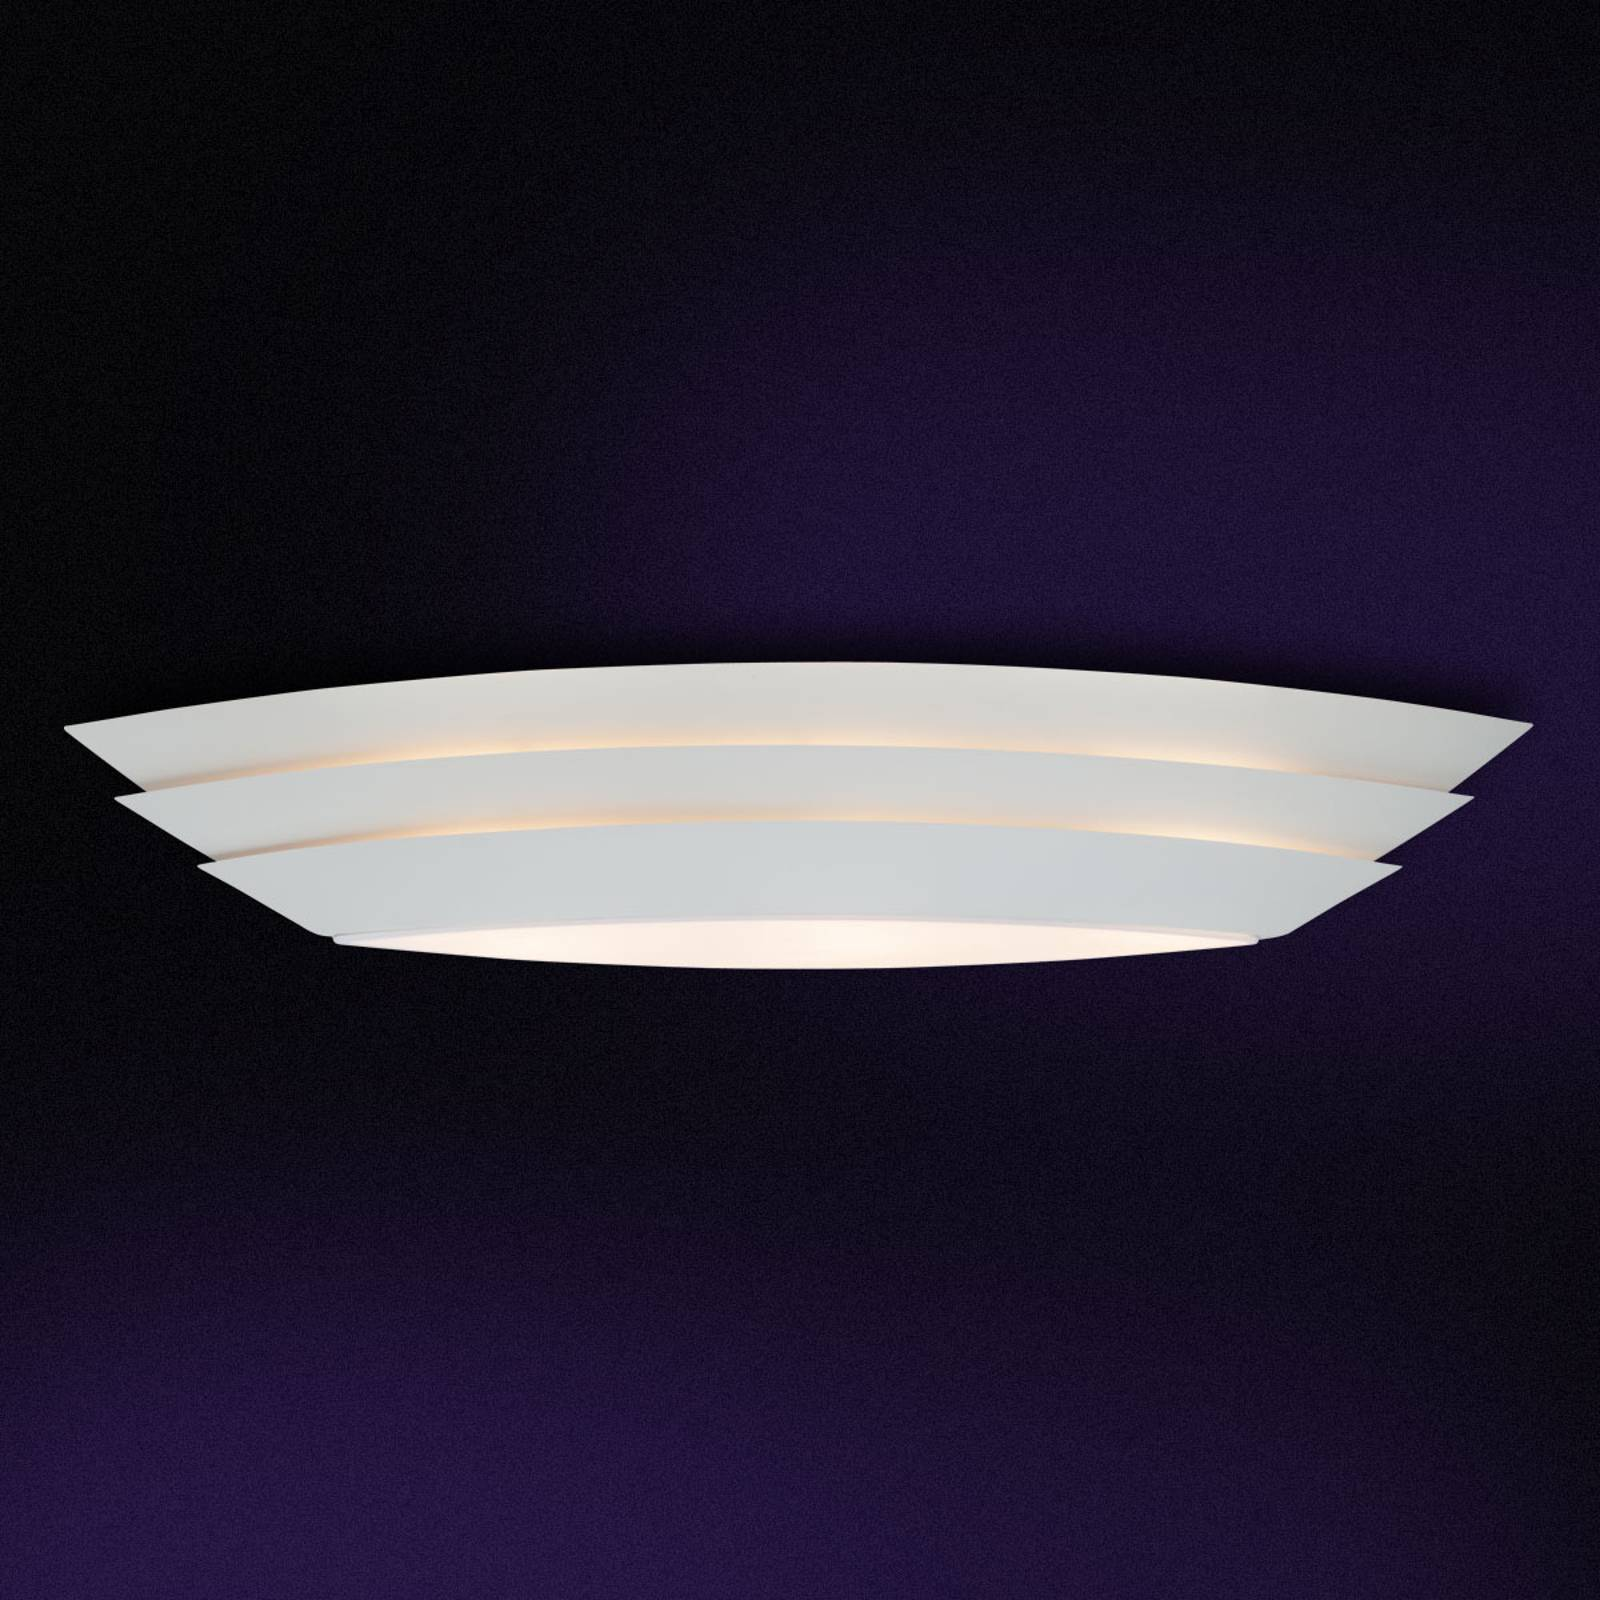 Lampa sufitowa SHIP o ciekawej formie